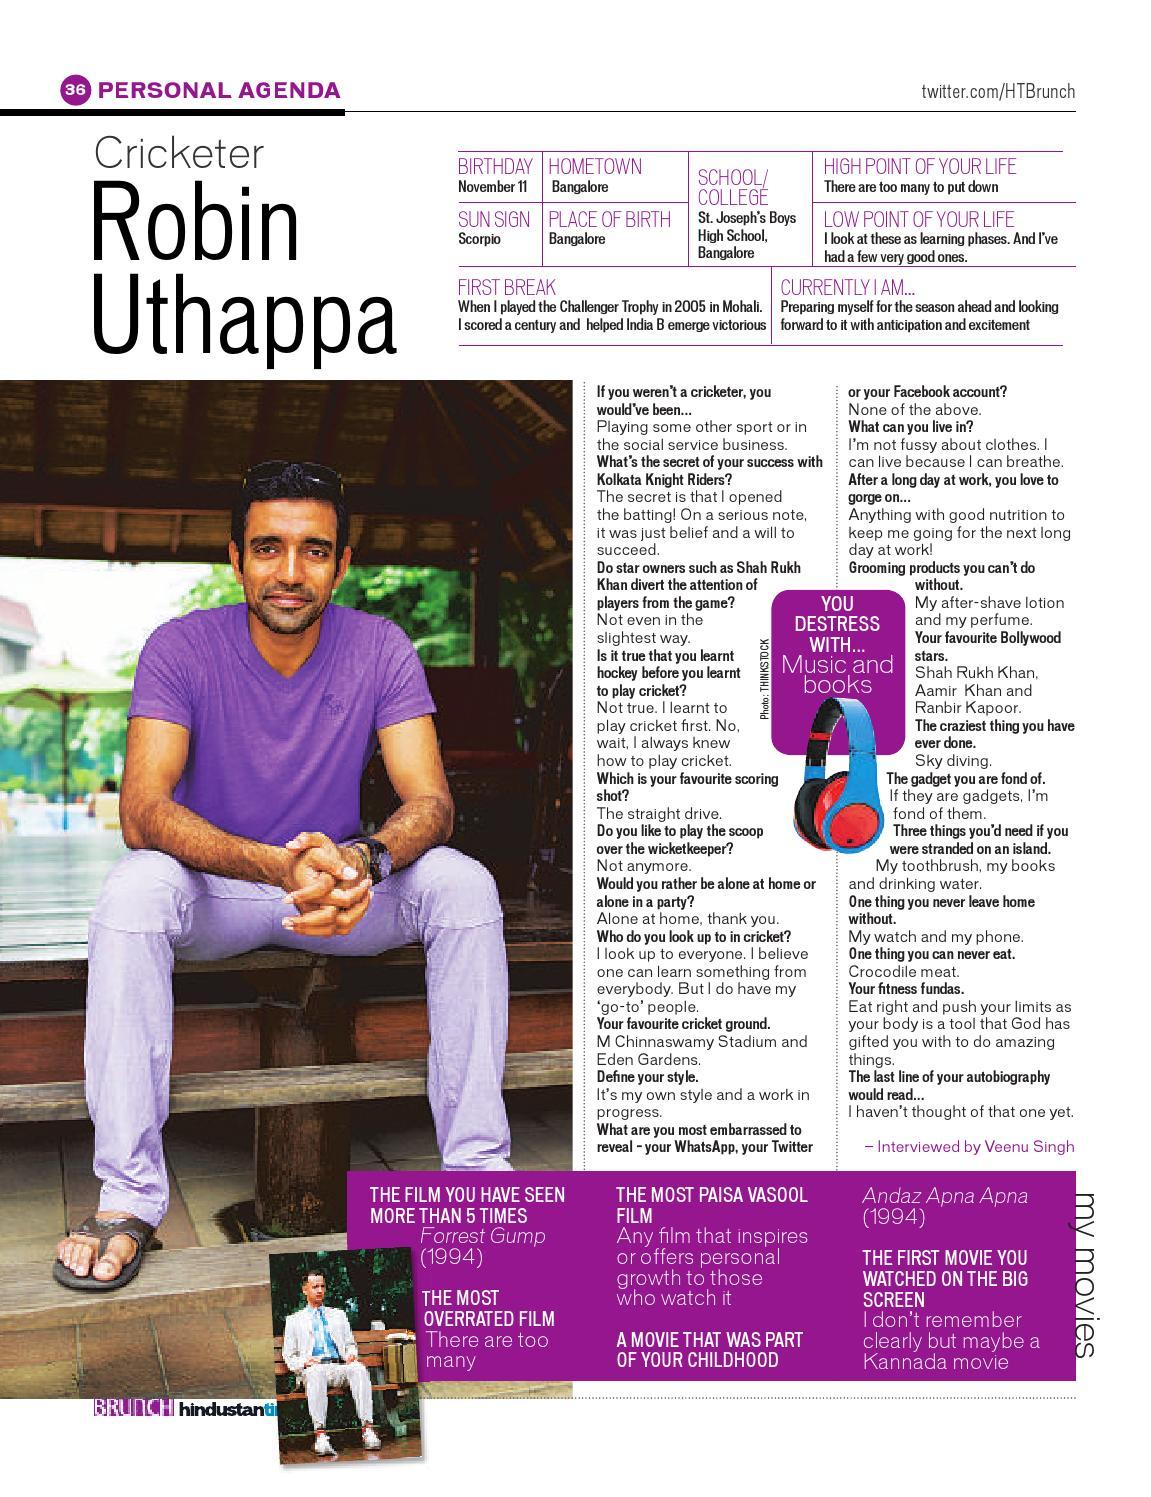 About Robin Uthapa